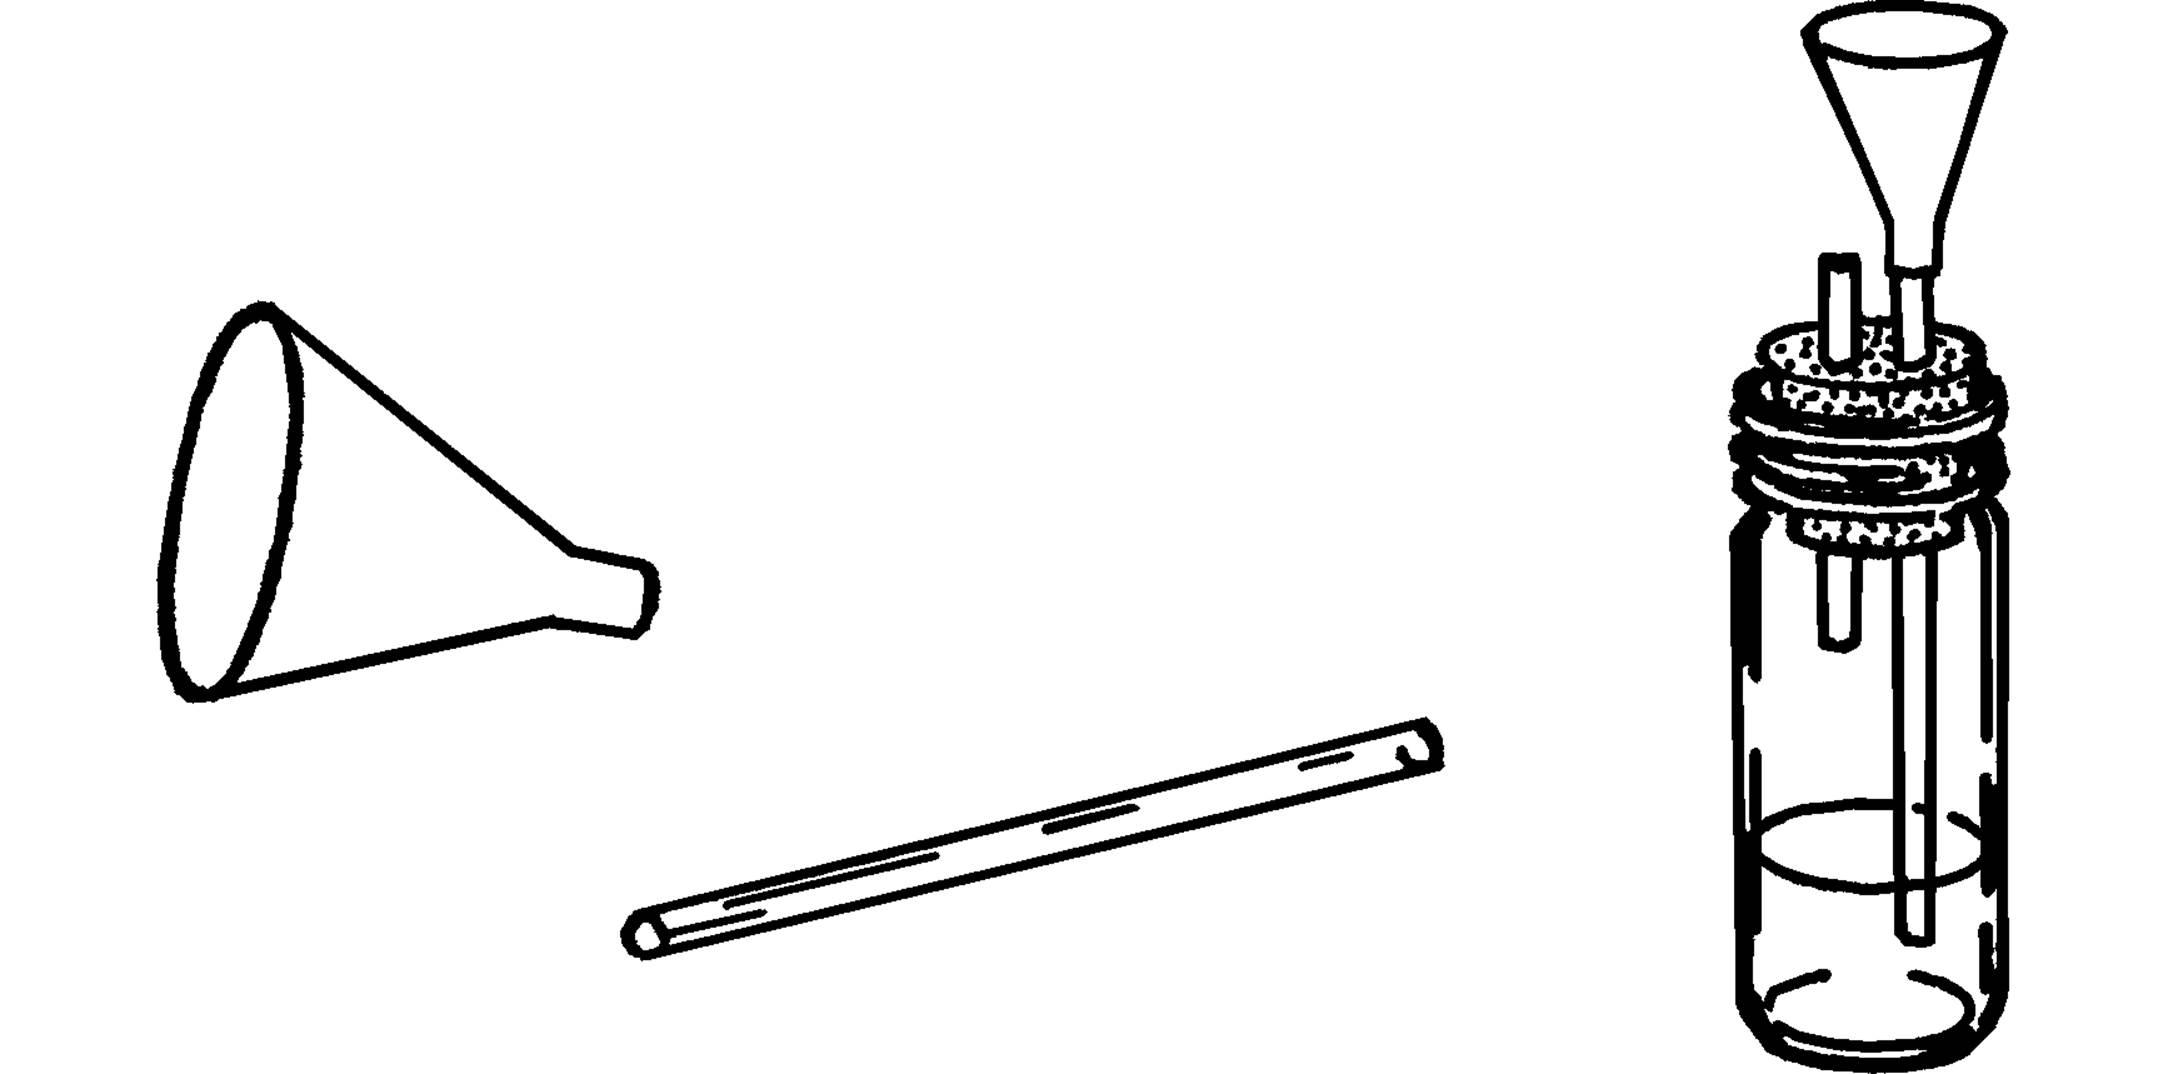 Thistle tube.